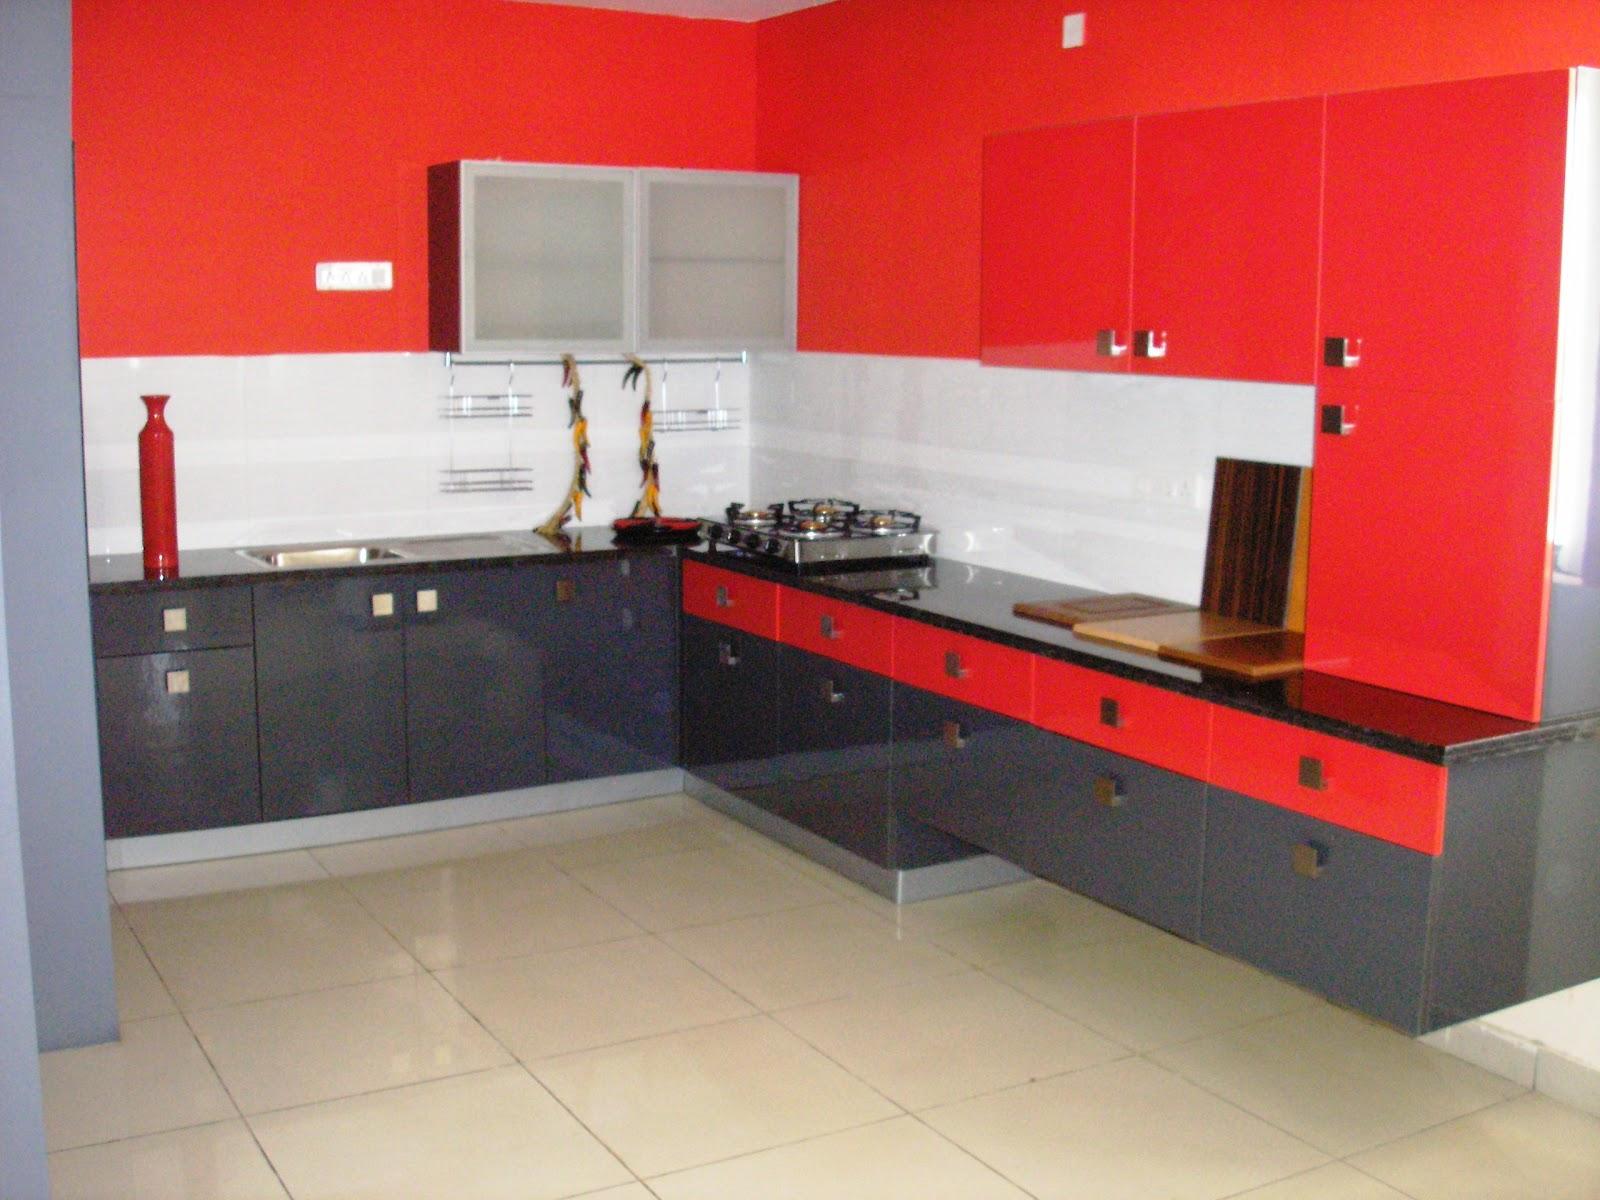 Elegant Red Kitchen Ideas (Image 3 of 10)